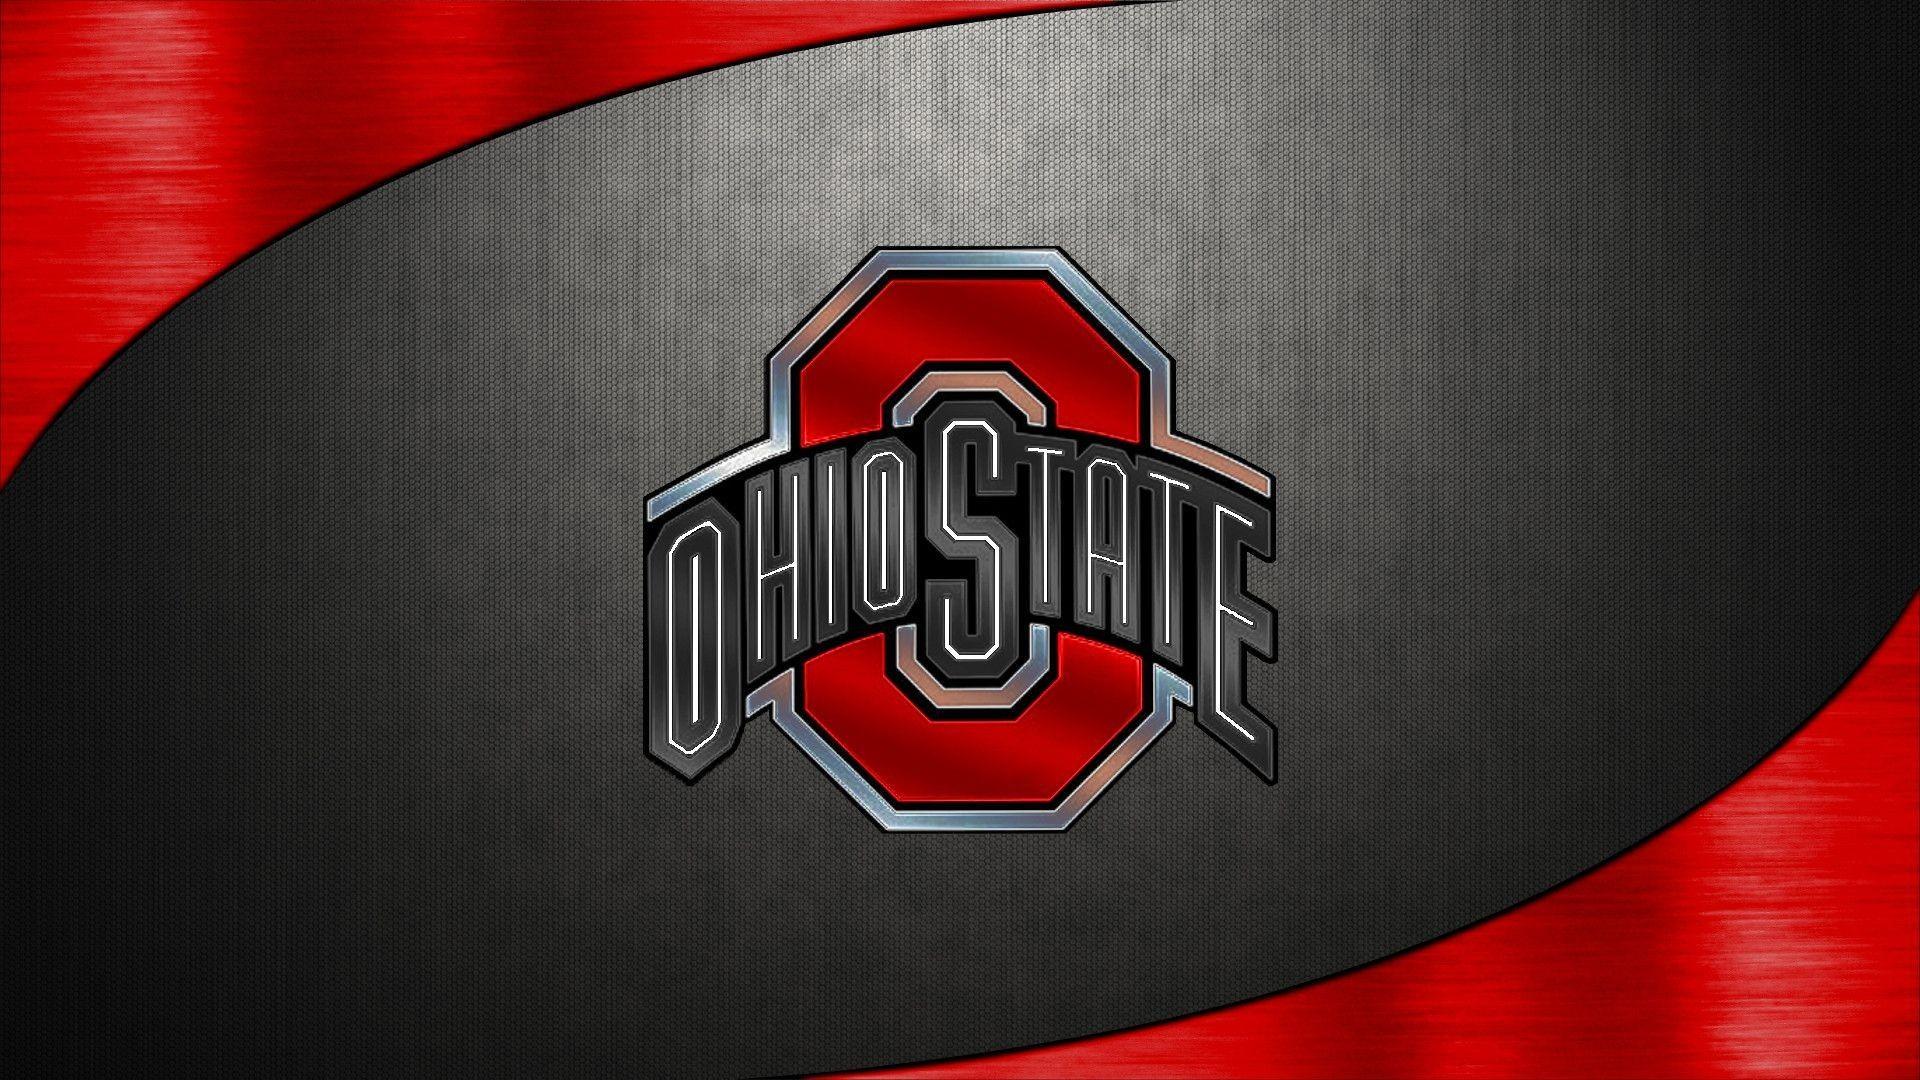 OSU Desktop Wallpaper Ohio State Football Wallpaper | HD Wallpapers |  Pinterest | Buckeyes, Hd wallpaper and Wallpaper